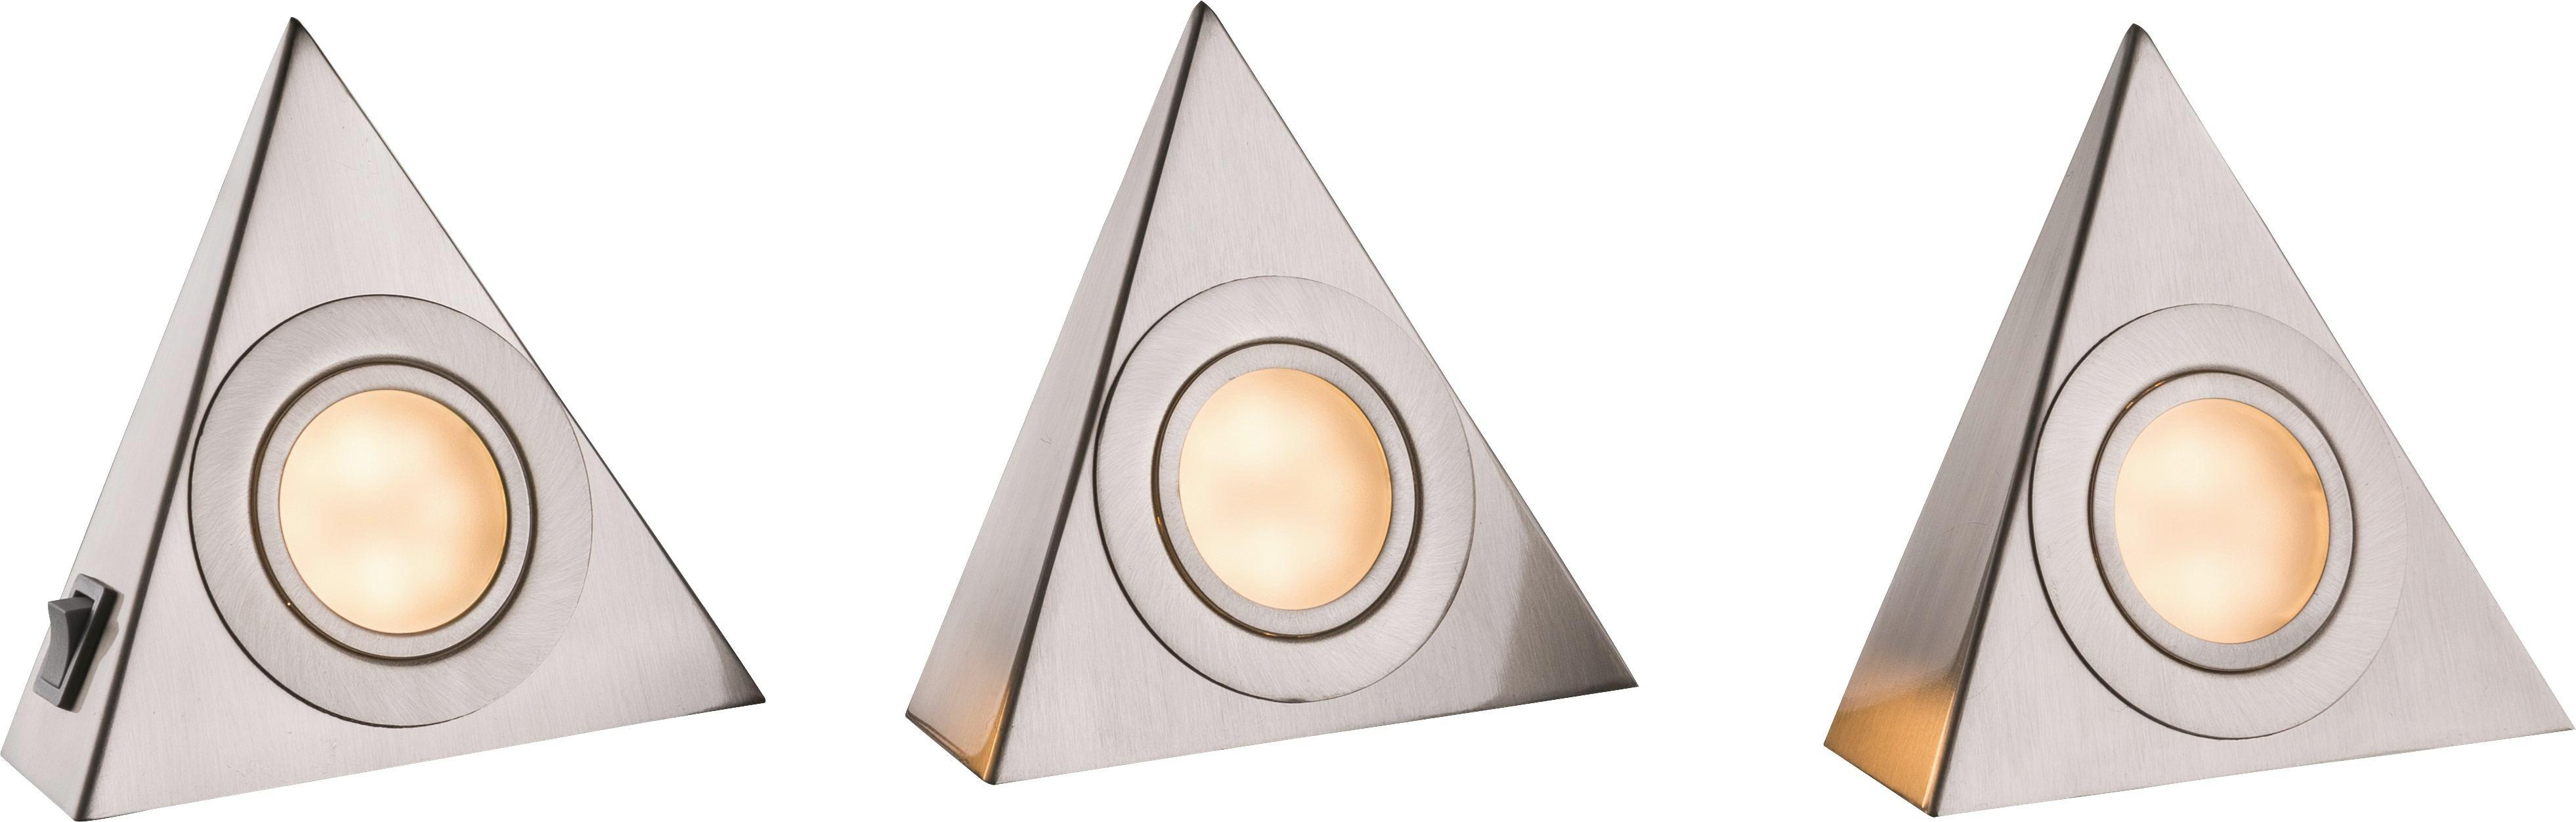 Beépíthető Lámpa Ulla - fém (14/12,5/4,5cm) - MÖMAX modern living